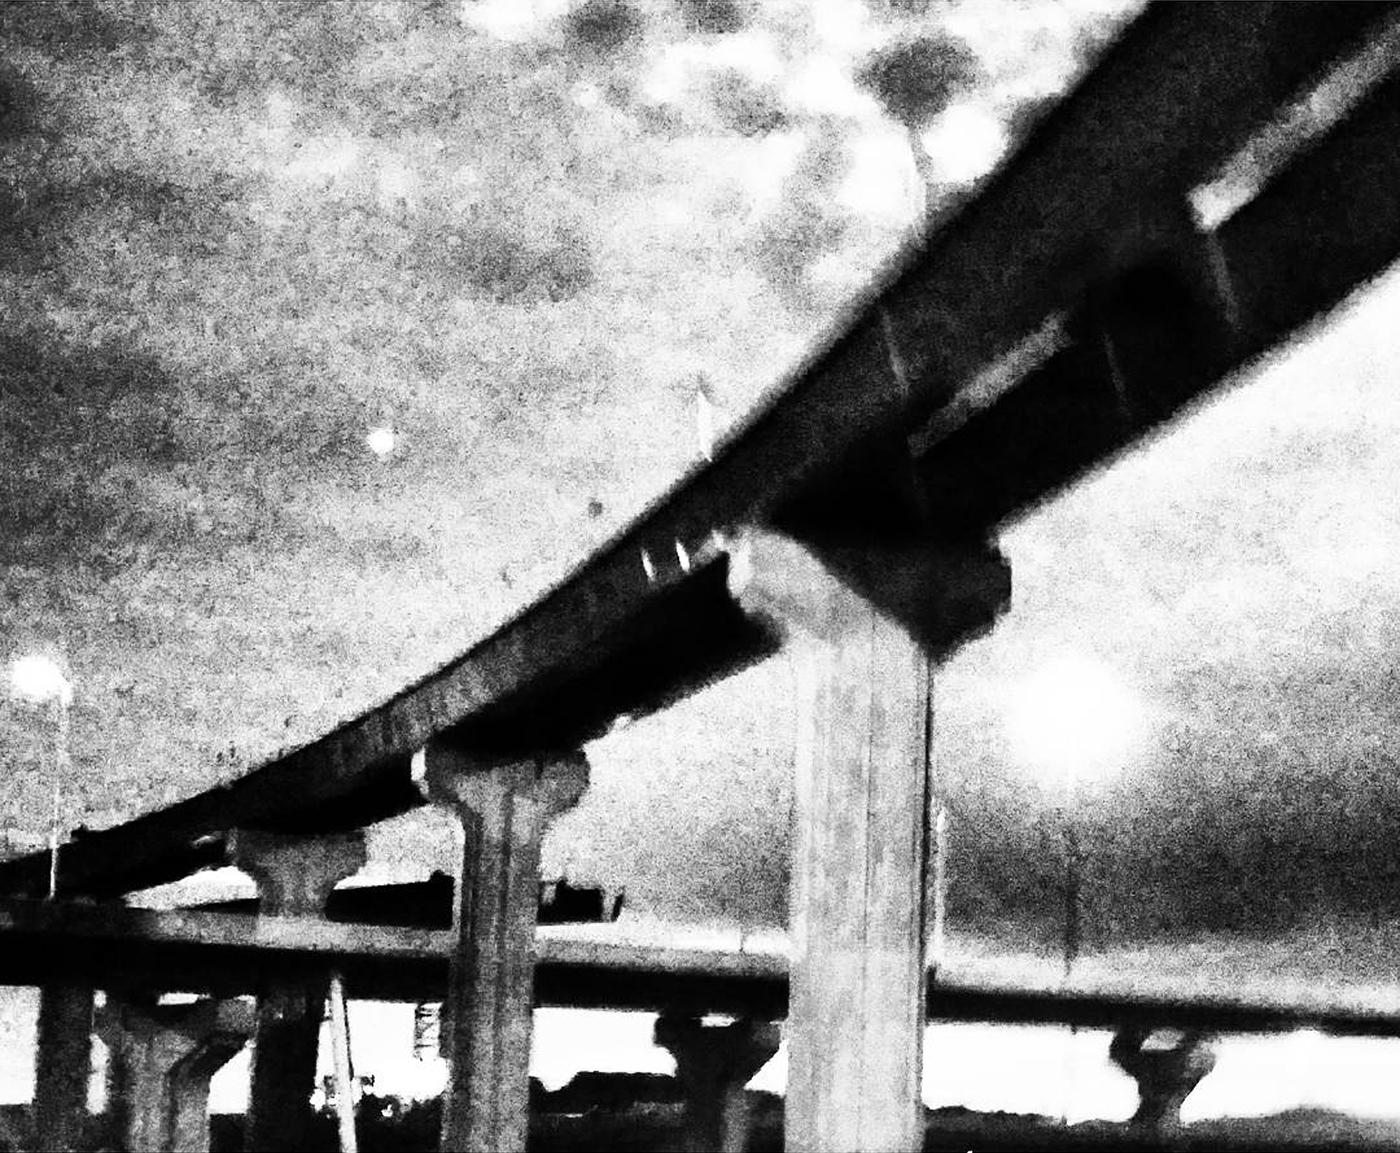 Untitled - Sharpened.jpg